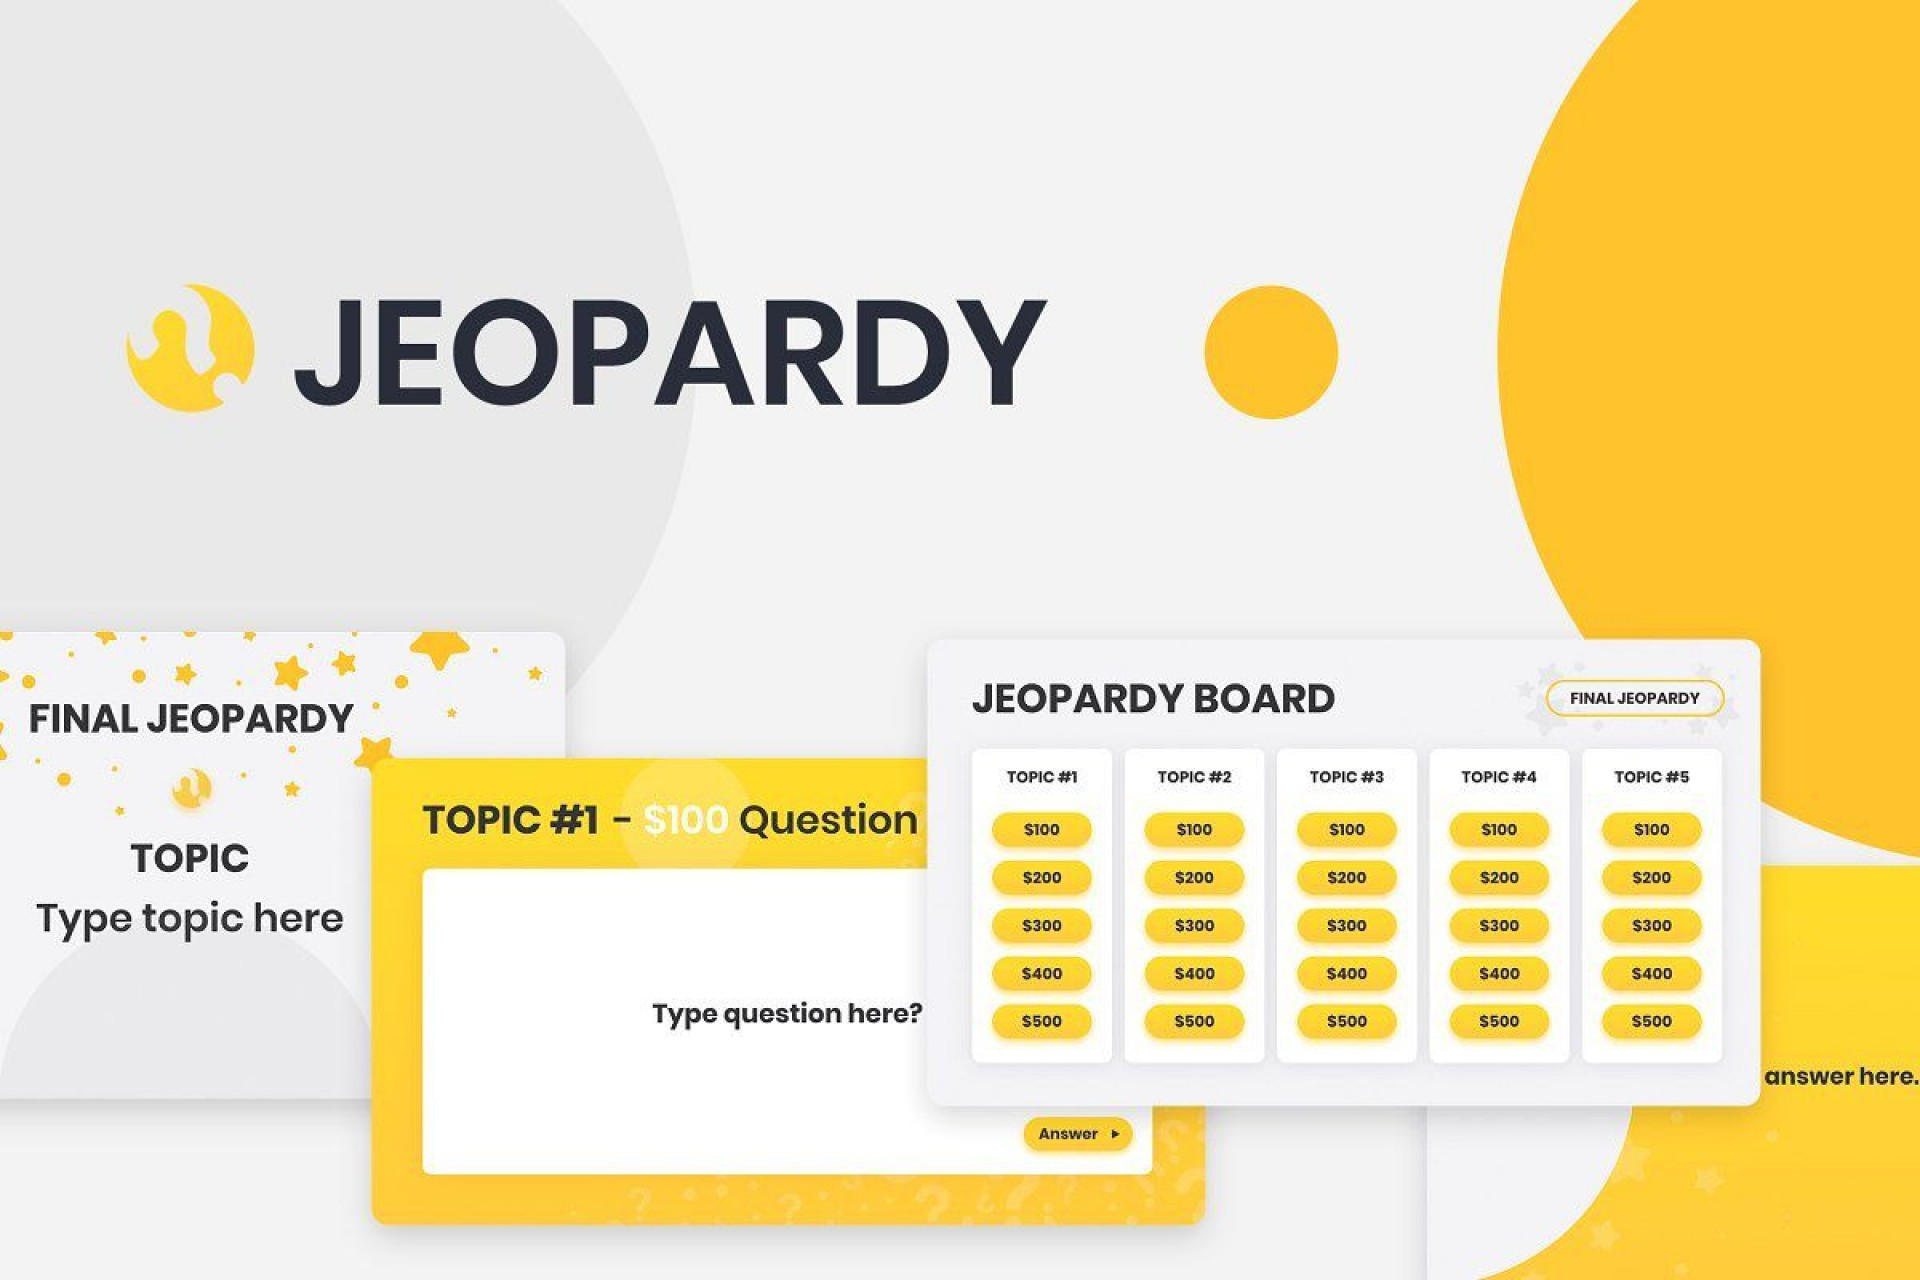 009 Magnificent Jeopardy Template Google Slide Sample  Slides Board Blank Best1920